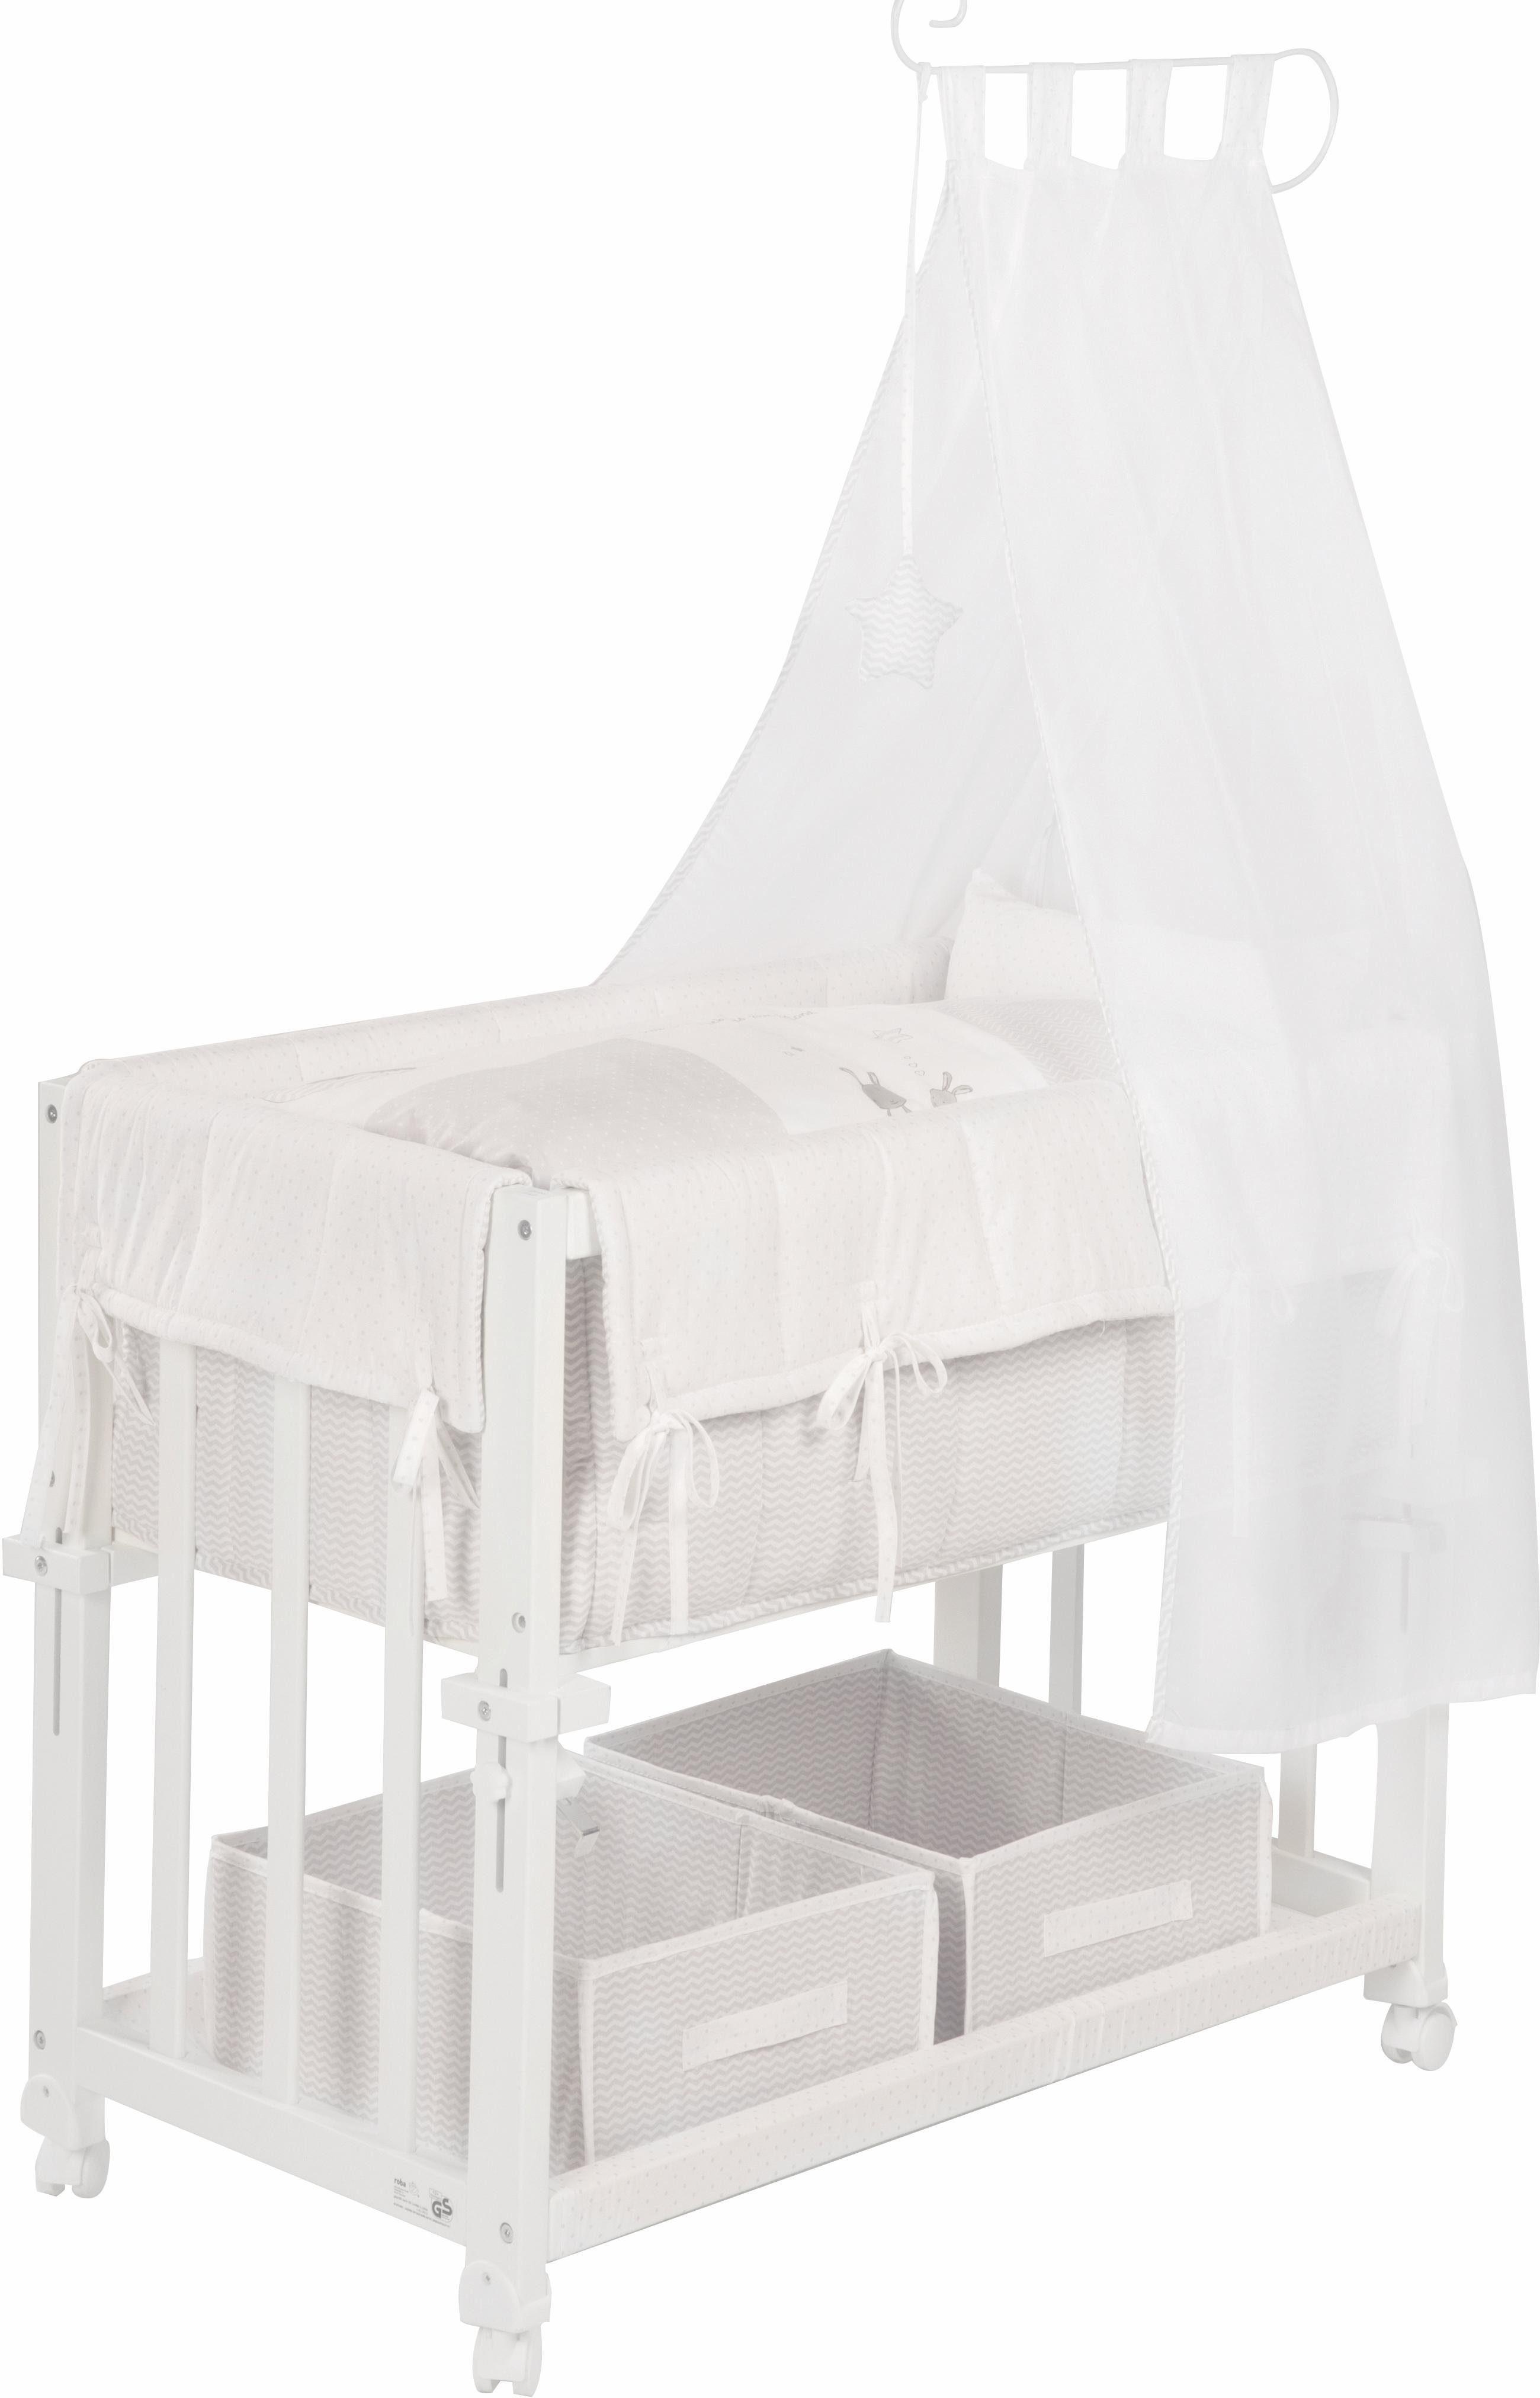 Roba Stubenbett Beistellbett 4in1 weiß lackiert inkl Textilien Indibär NEU